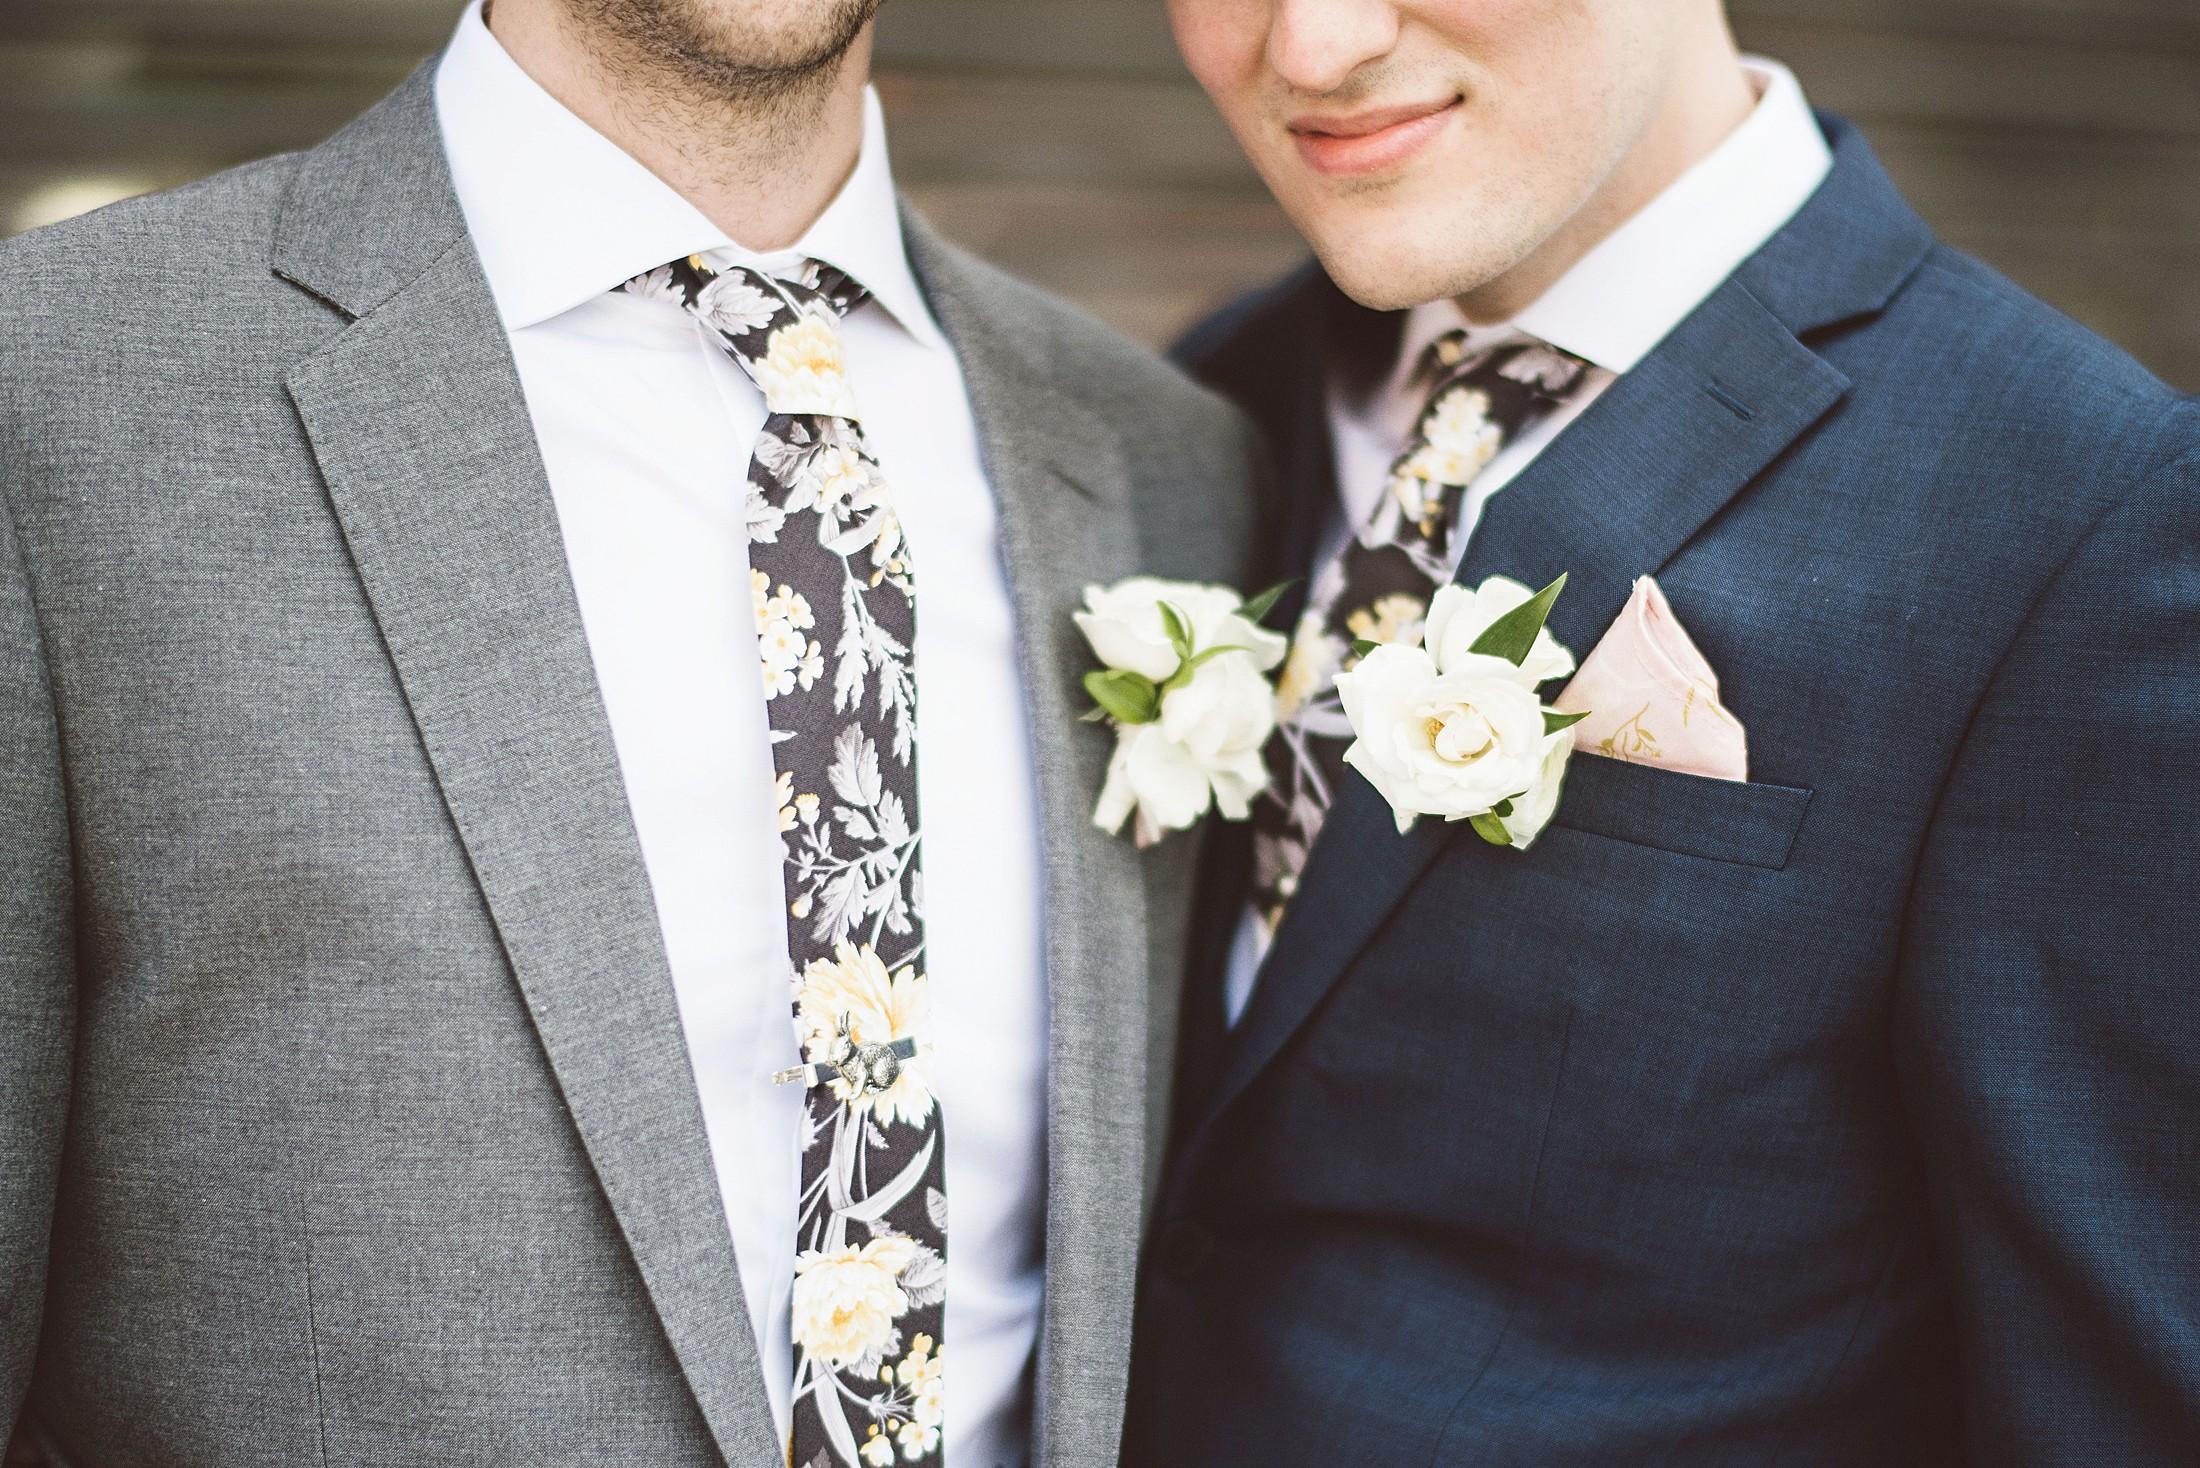 lgbt_wedding_minneapolis_photo_by_lucas_botz_photography_2018-01-04_0004.jpg